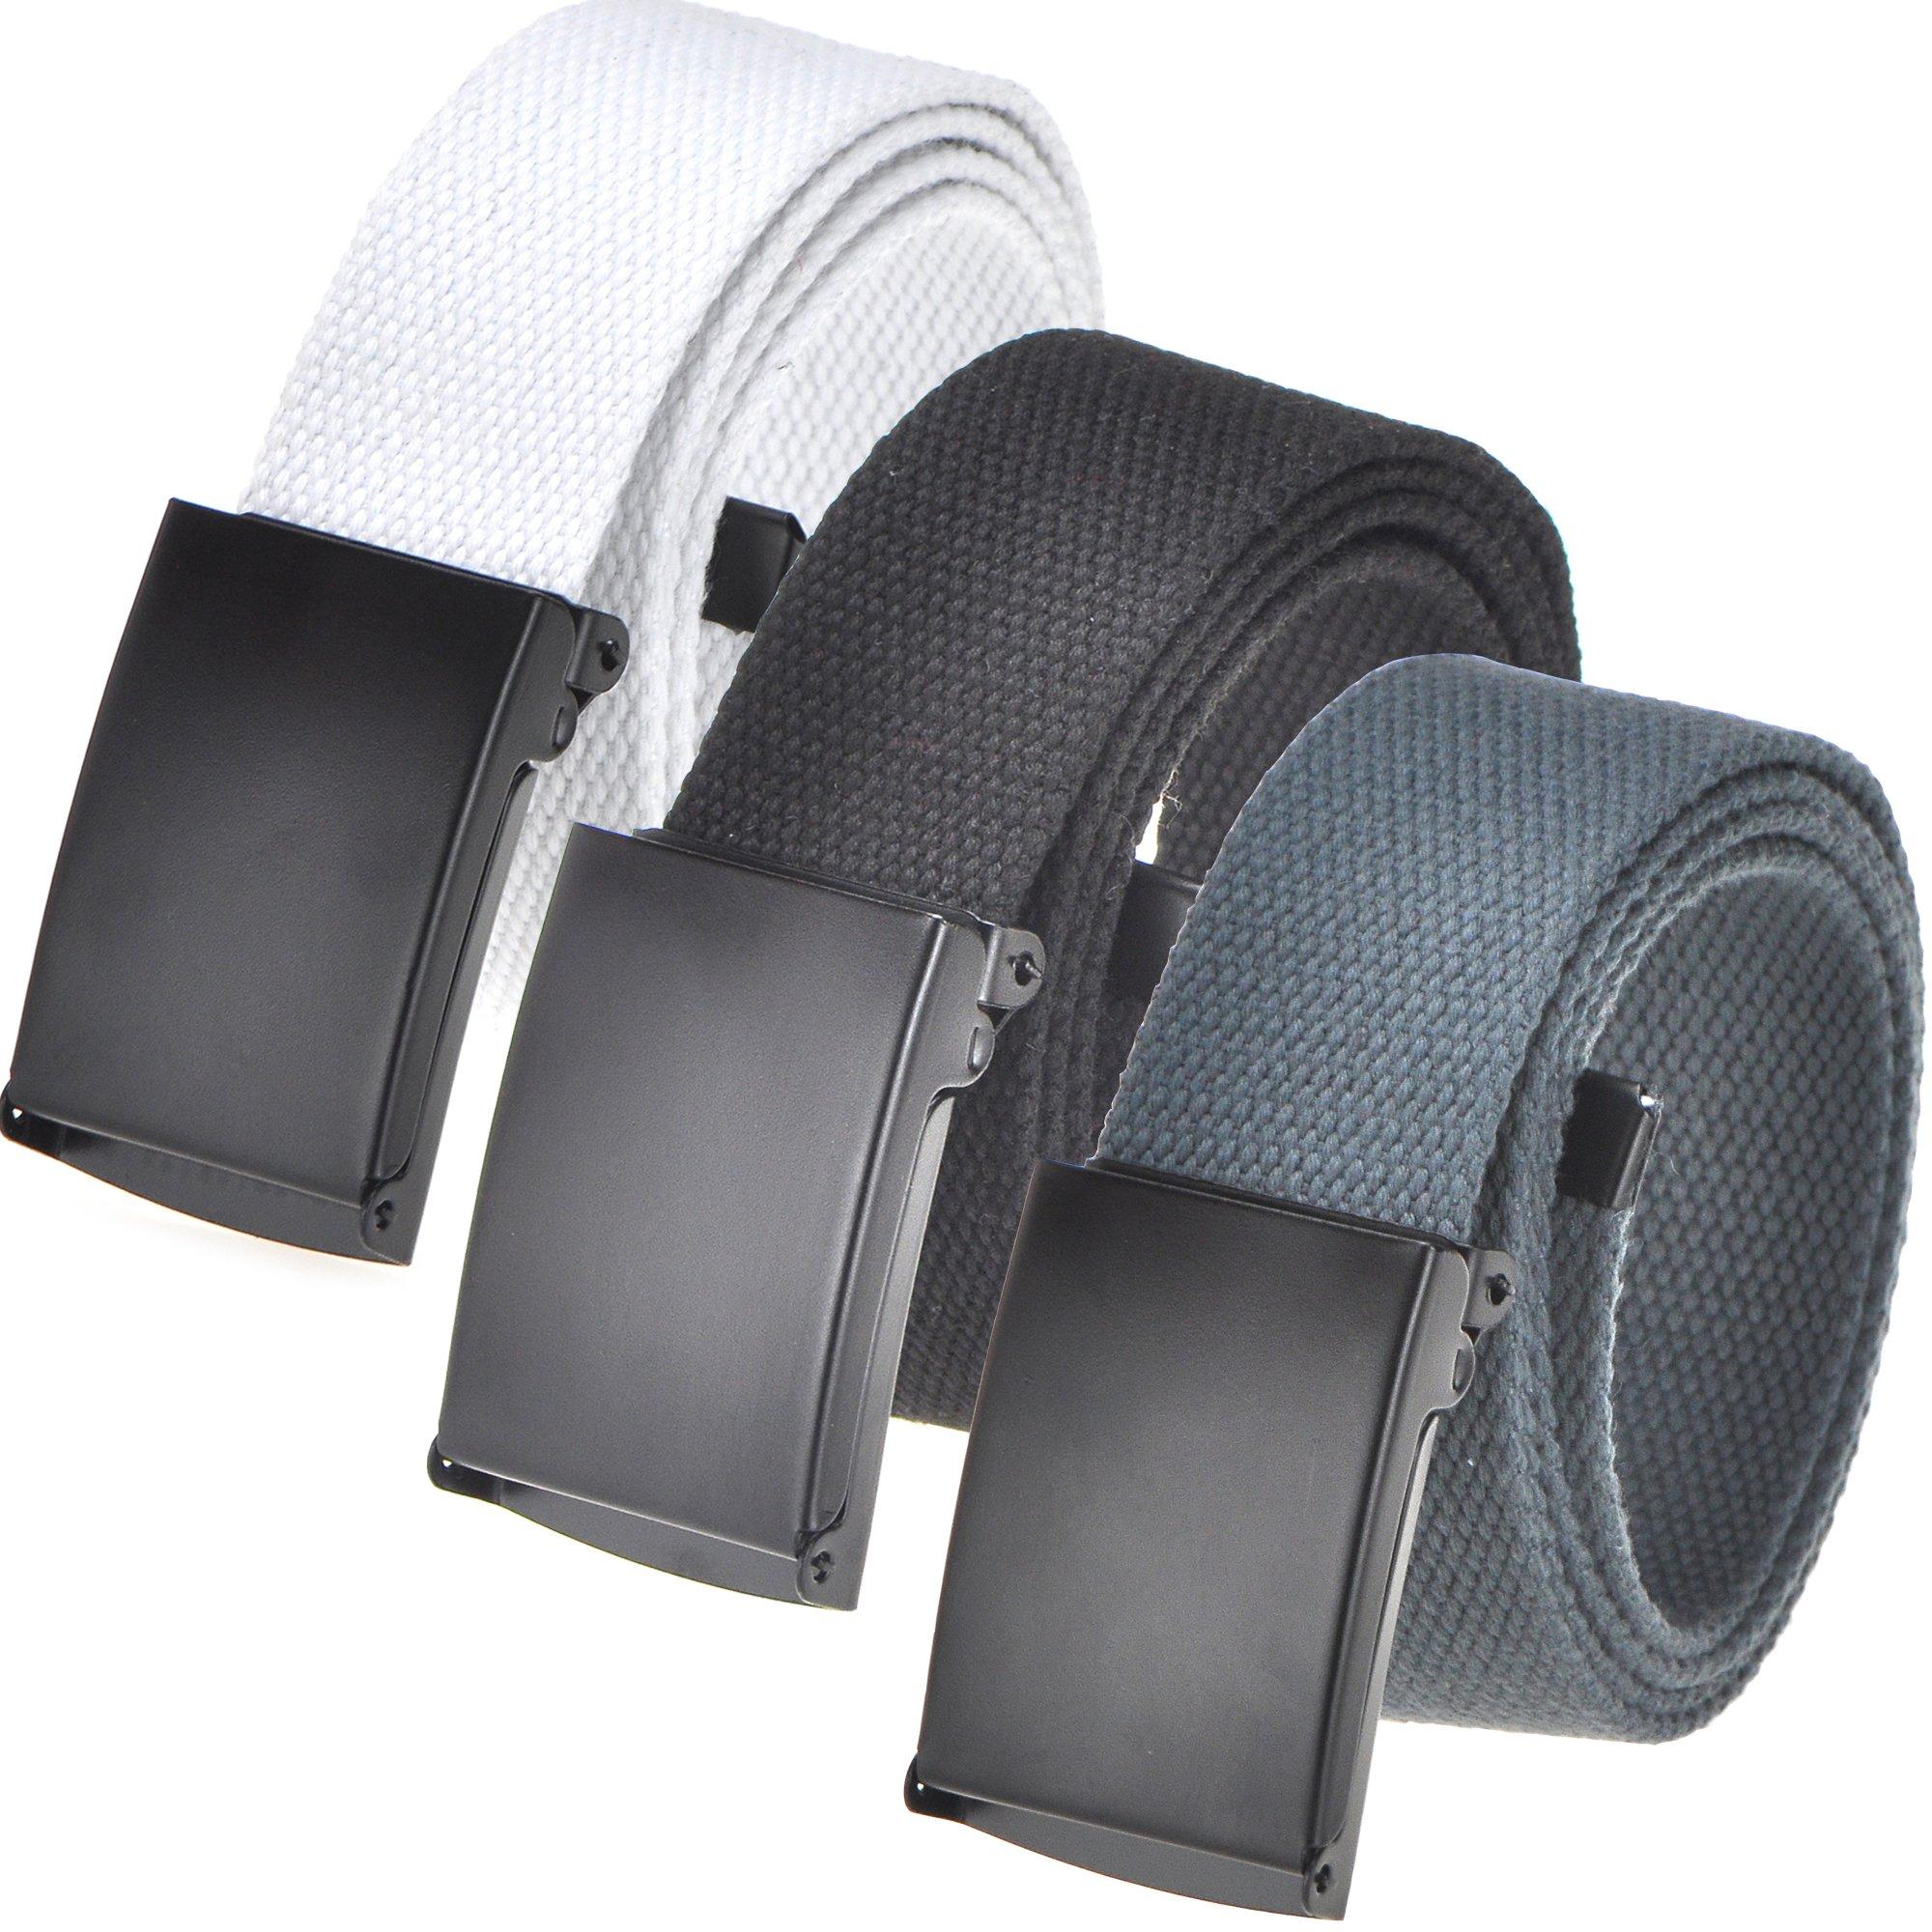 Men's Casual Outdoor Belt 16 colors, Canvas Web belt Waist Flip-Top Solid Black Buckle Up to 56'' (3 Pack, Black/Natural/Dk Grey)